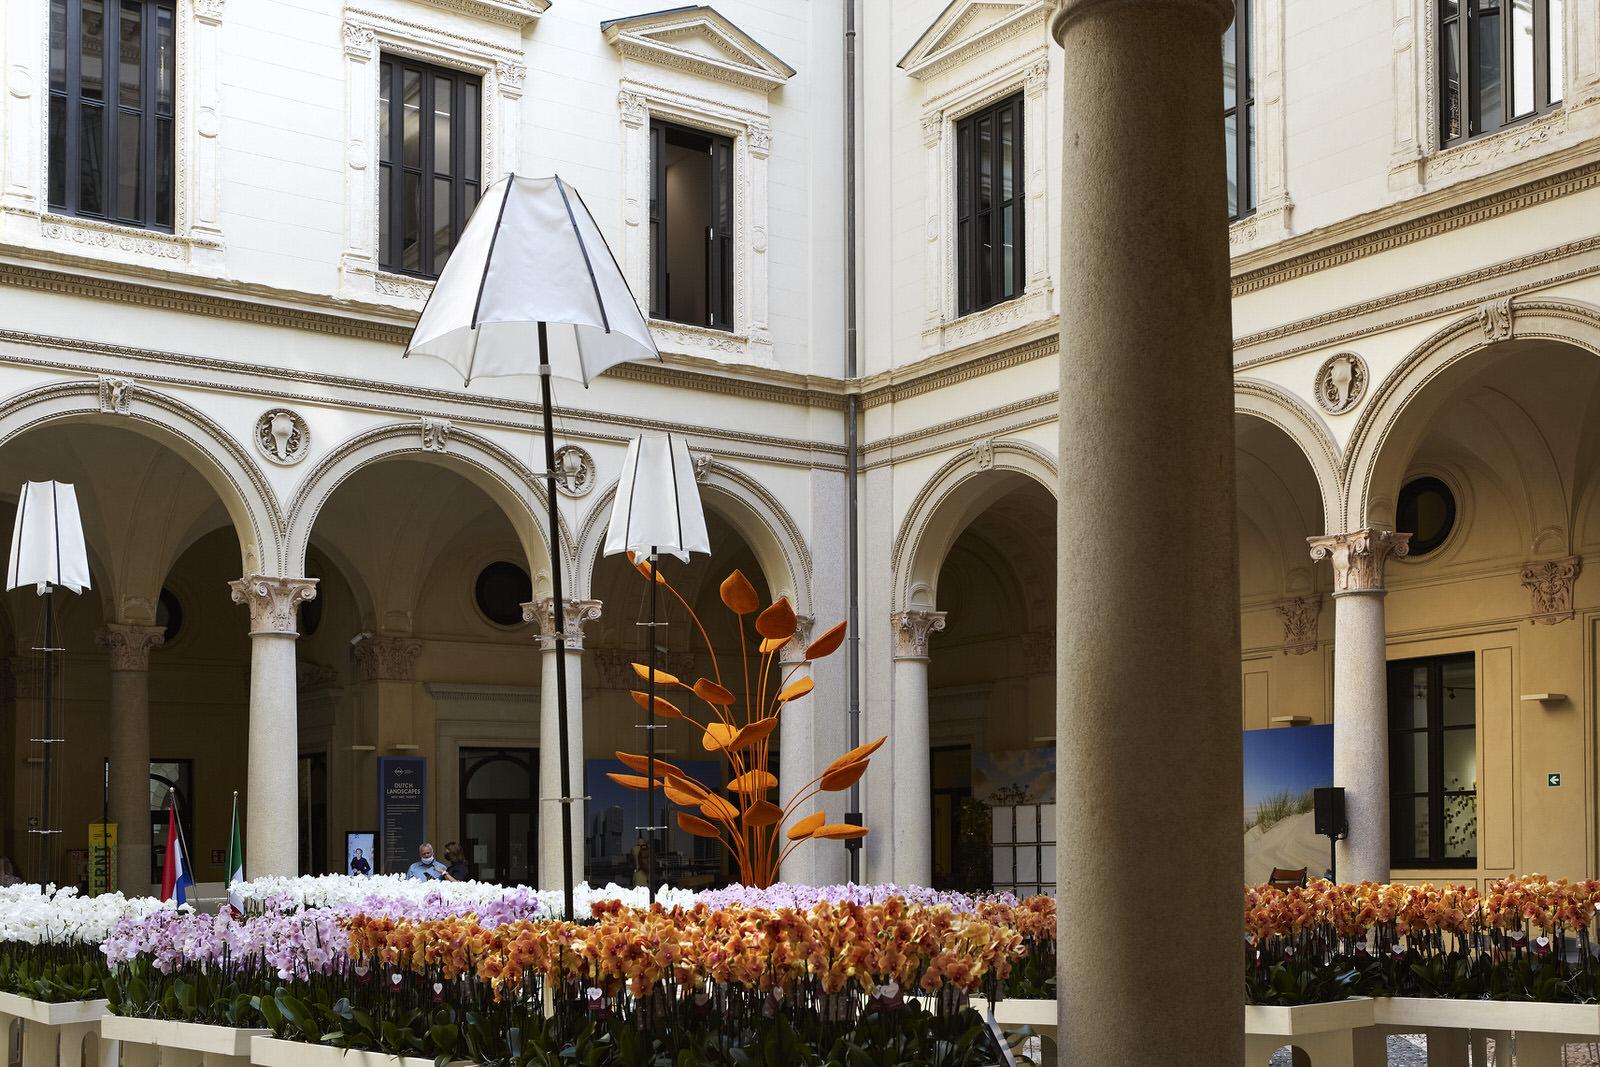 Vouw Bloomlight Masterly Palazzo Turati Milan Design Week 2021 Yellowtrace 05